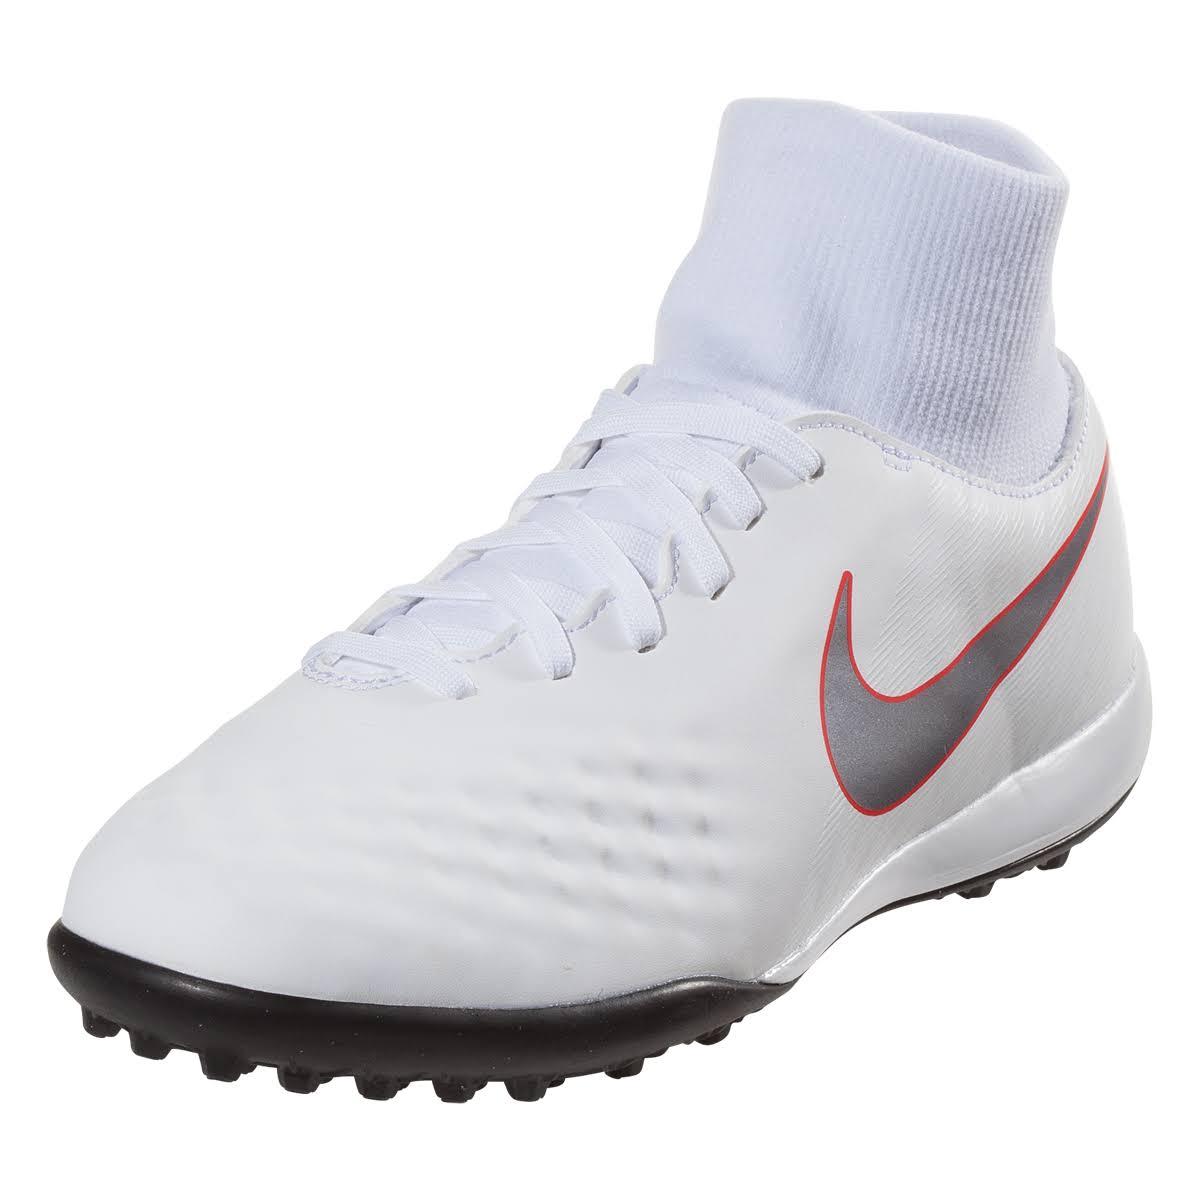 2 Para Niños Df Tf Obrax Jr Calzado Ah7318107 Blanco De Nike Academy Fútbol ZAwFEPf